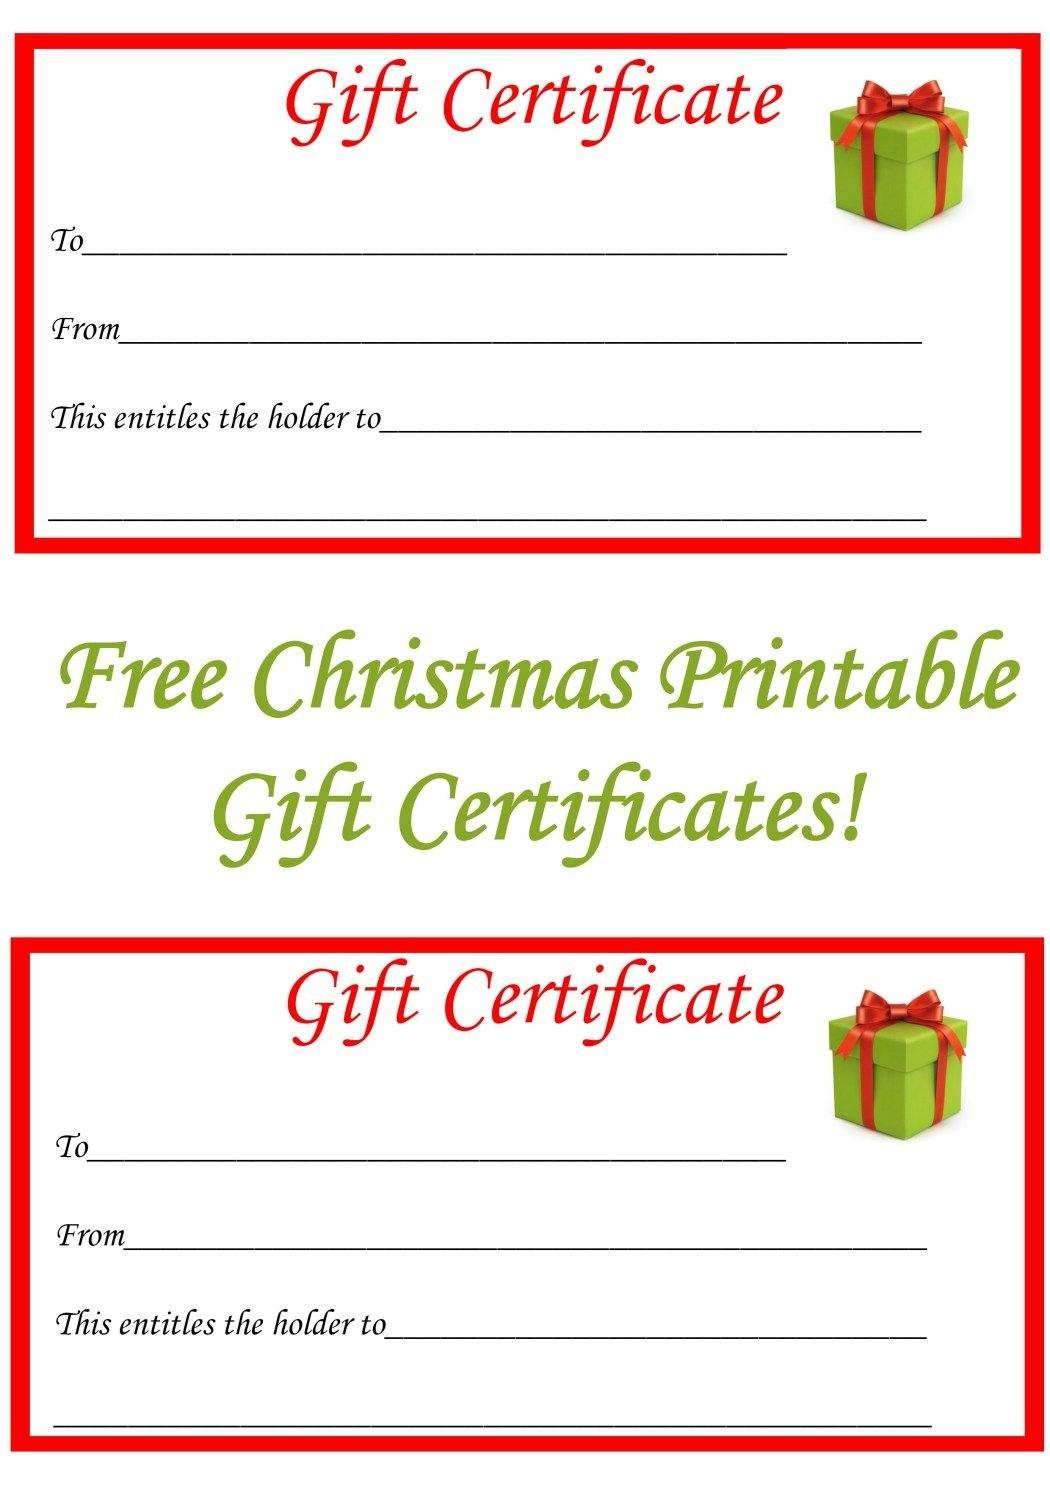 Free Christmas Printable Gift Certificates  Gift Ideas  Christmas Throughout Free Christmas Gift Certificate Templates